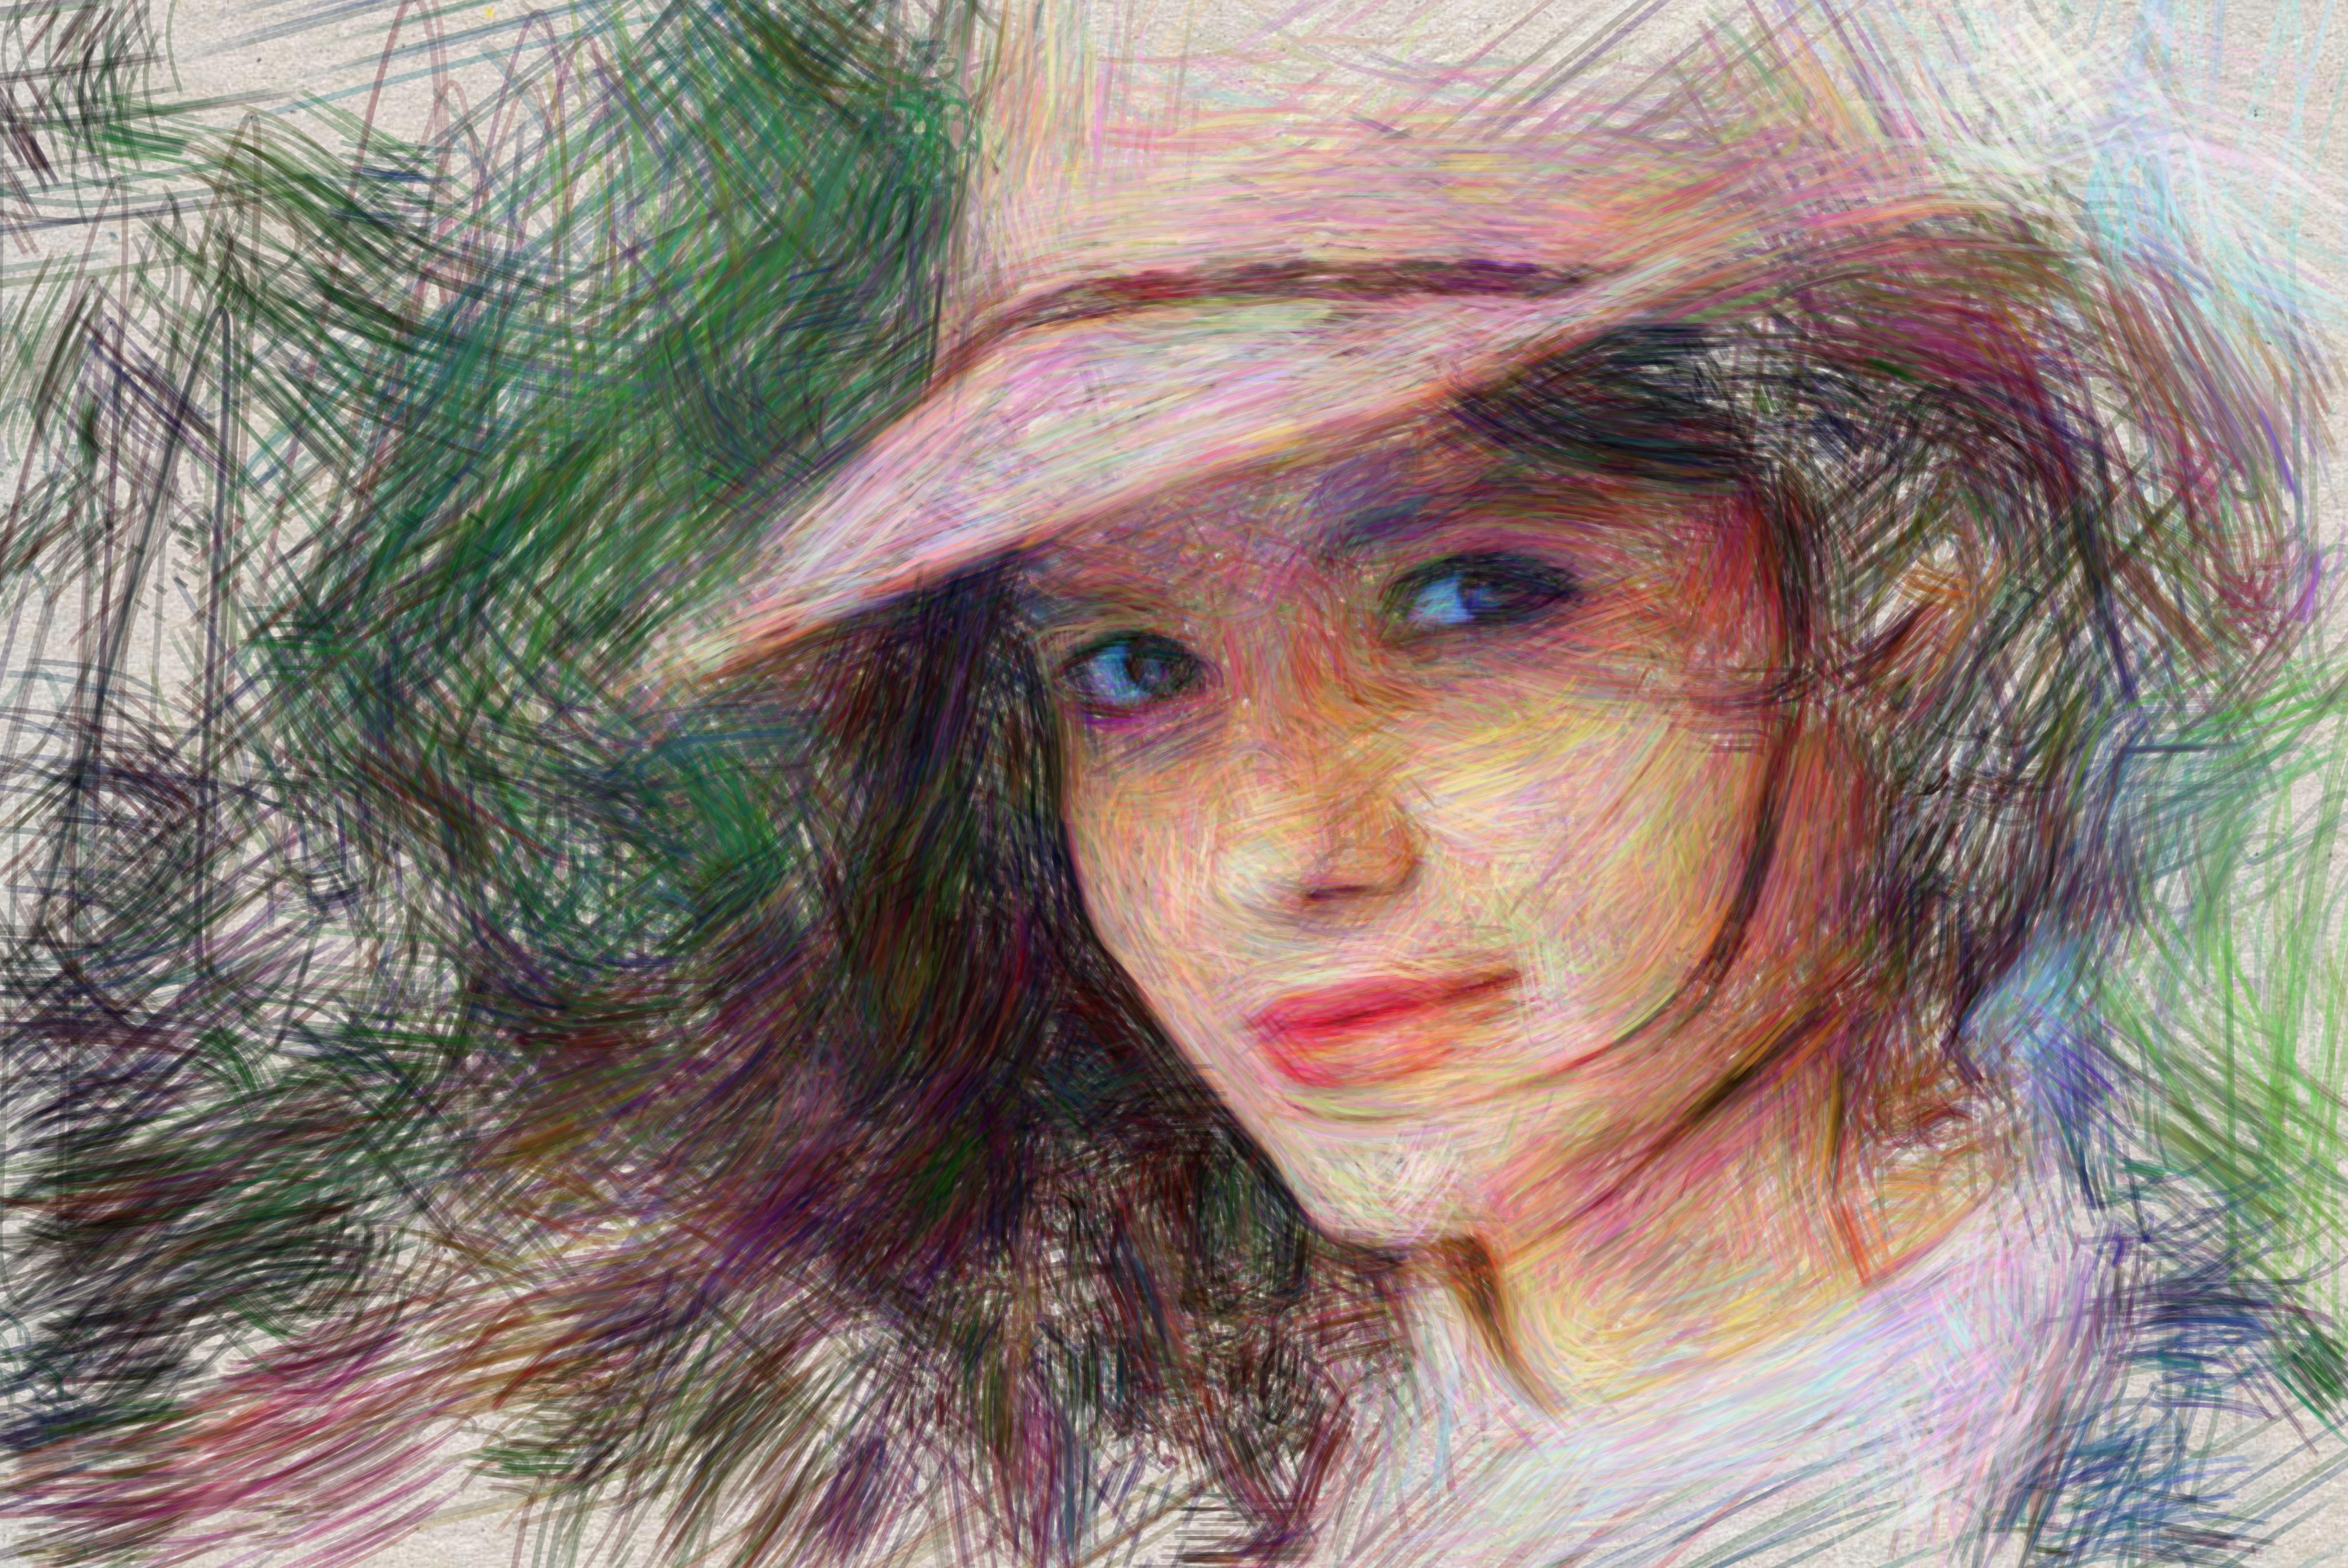 Expressive Sketch